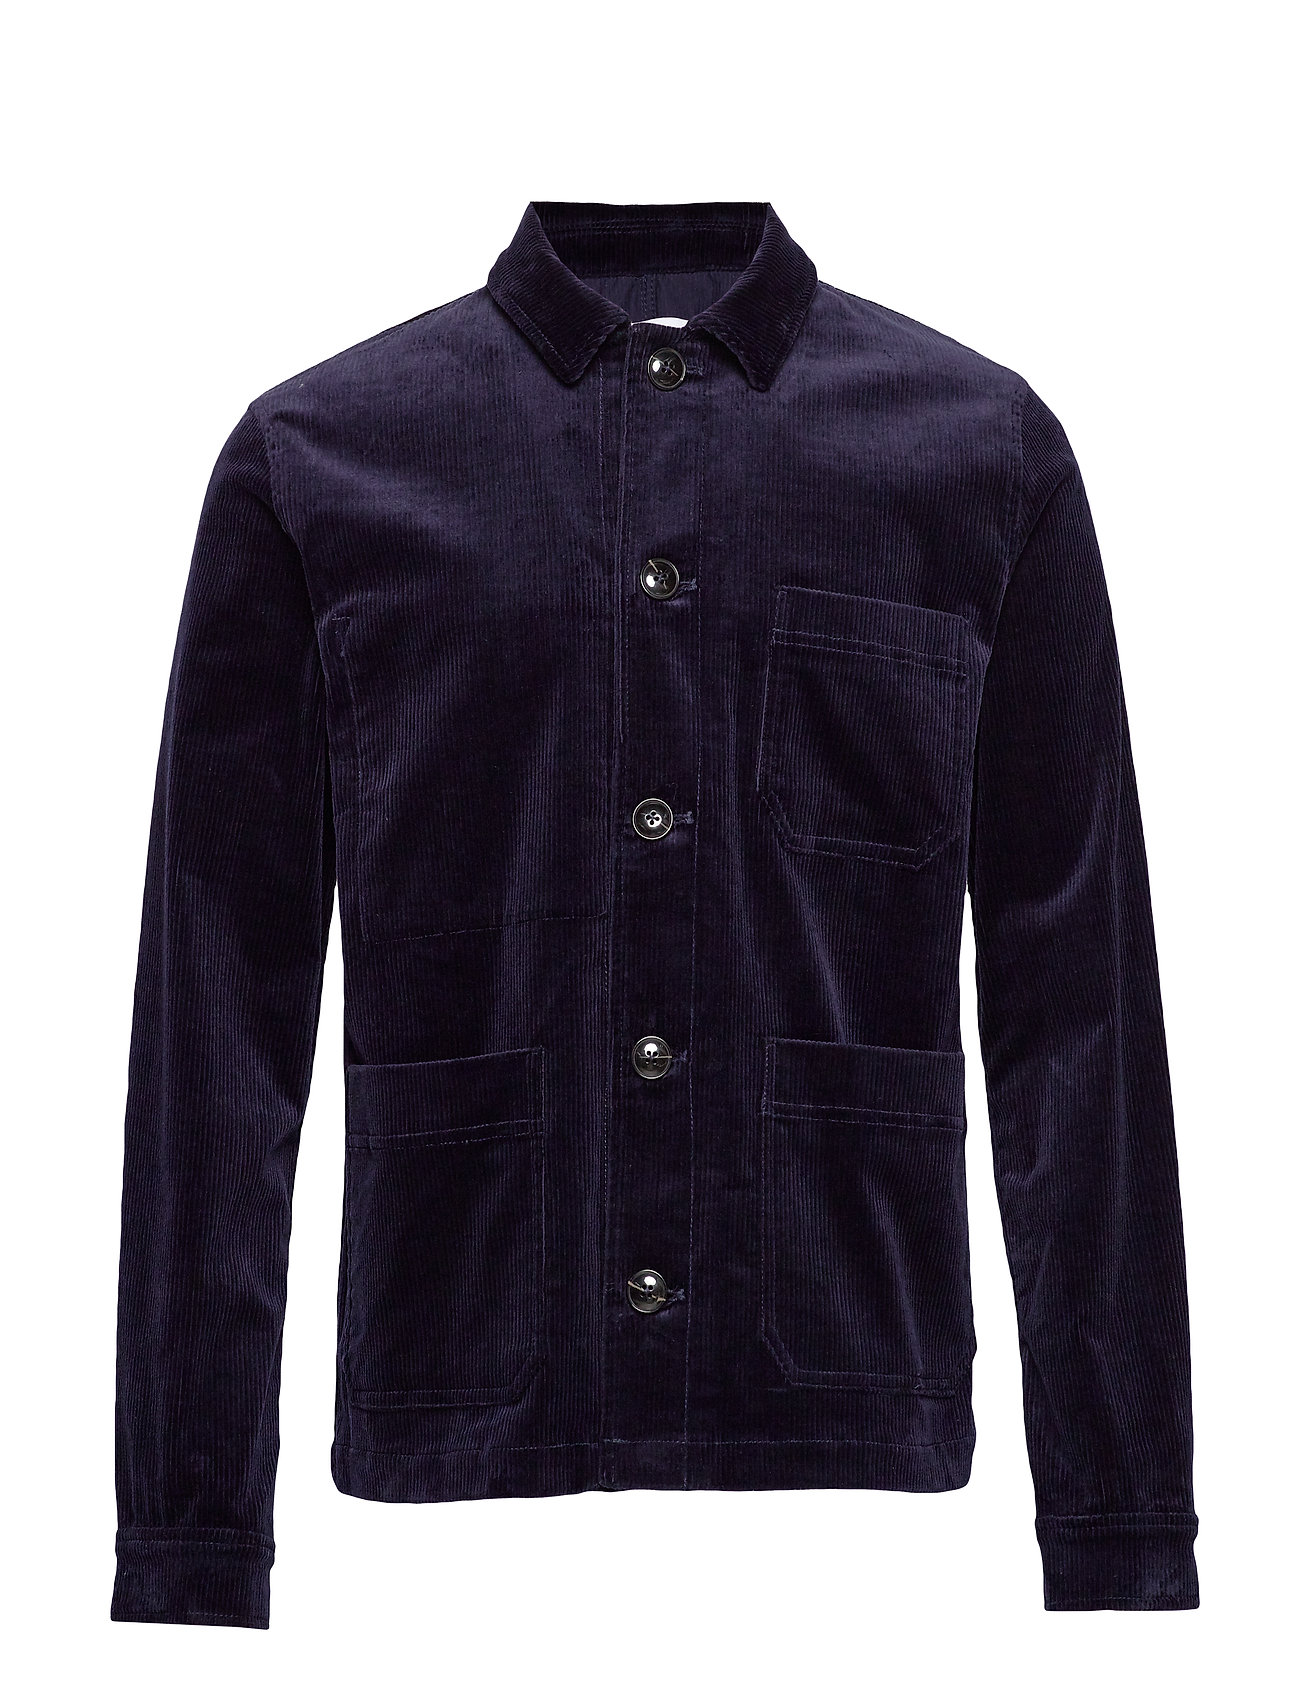 Samsøe & Samsøe Worker jacket 11046 - NIGHT SKY